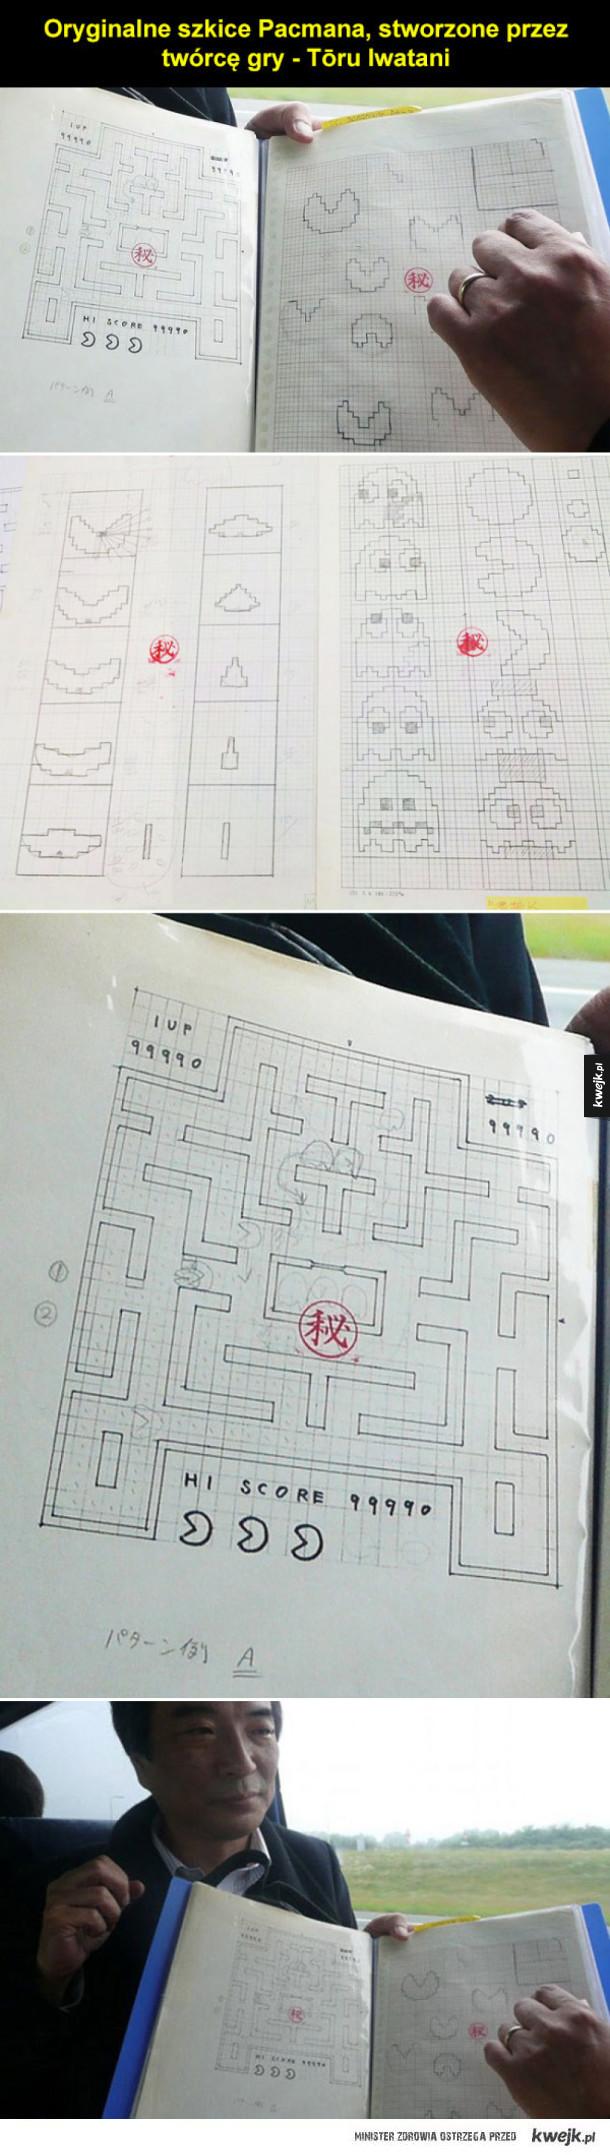 Jak powstał Pacman